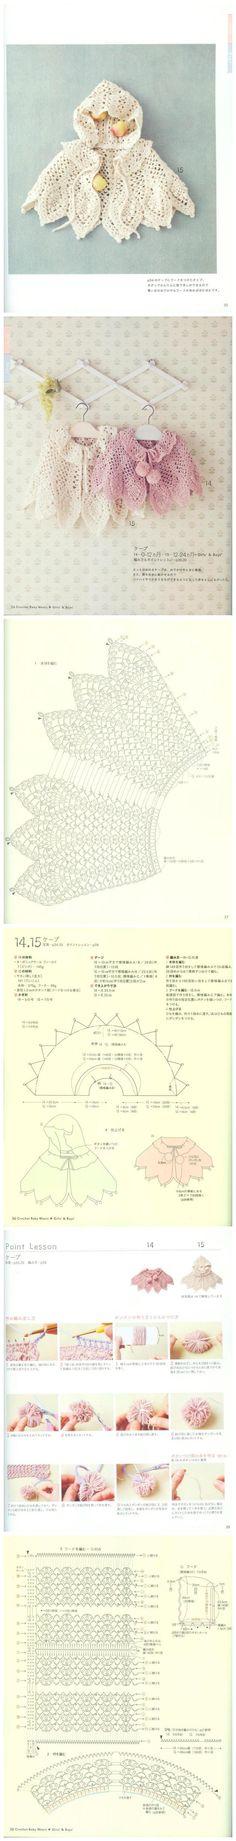 DIY,钩织,披风,手工制作